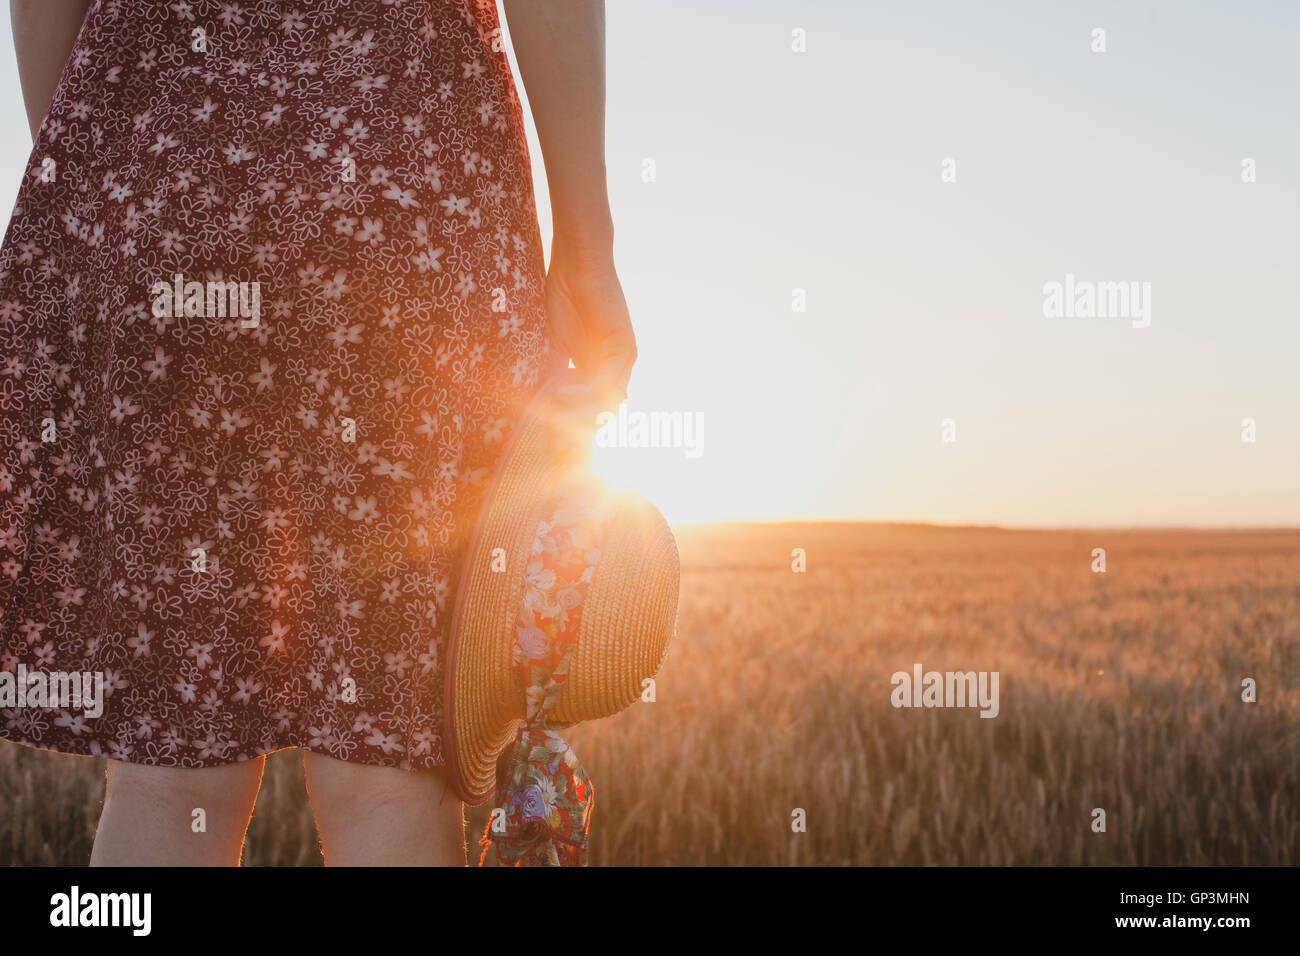 Despedida o concepto de espera, verano sunset, mujer mano sujetando hat Imagen De Stock